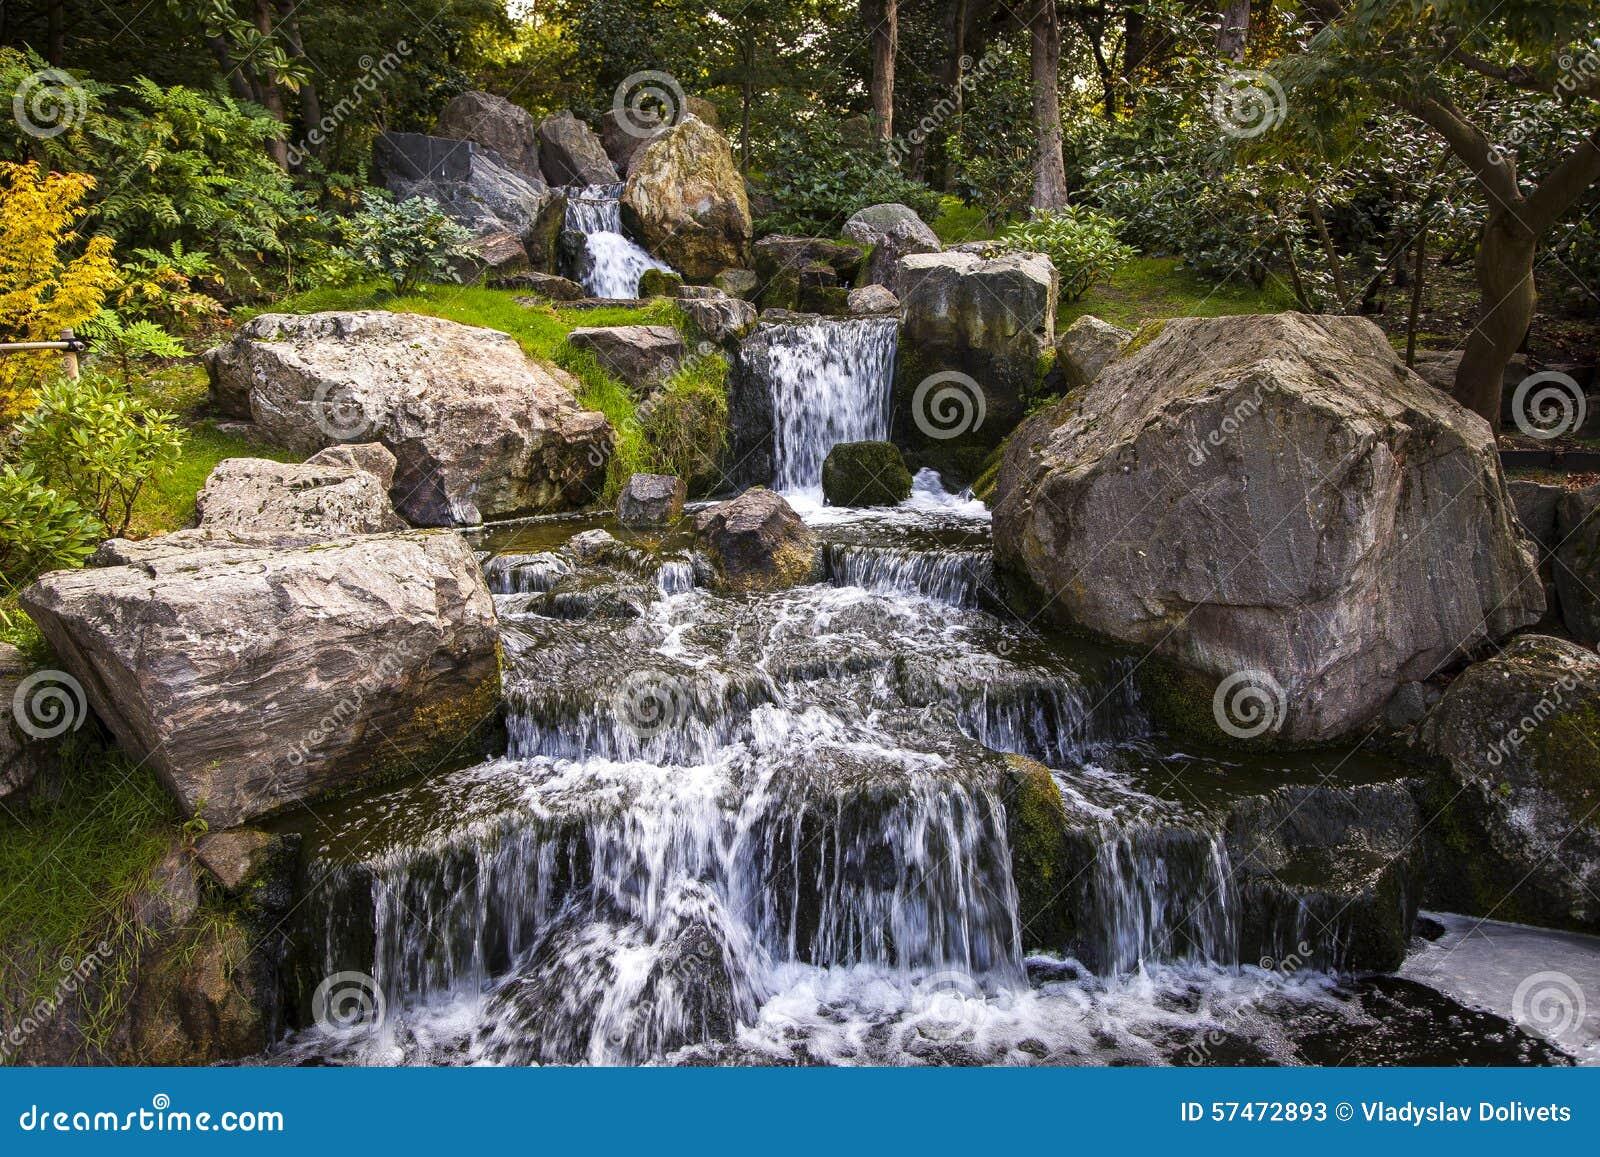 Wasserfall im japanischen garten london stockfoto bild 57472893 - Cascade de jardin castorama lyon ...